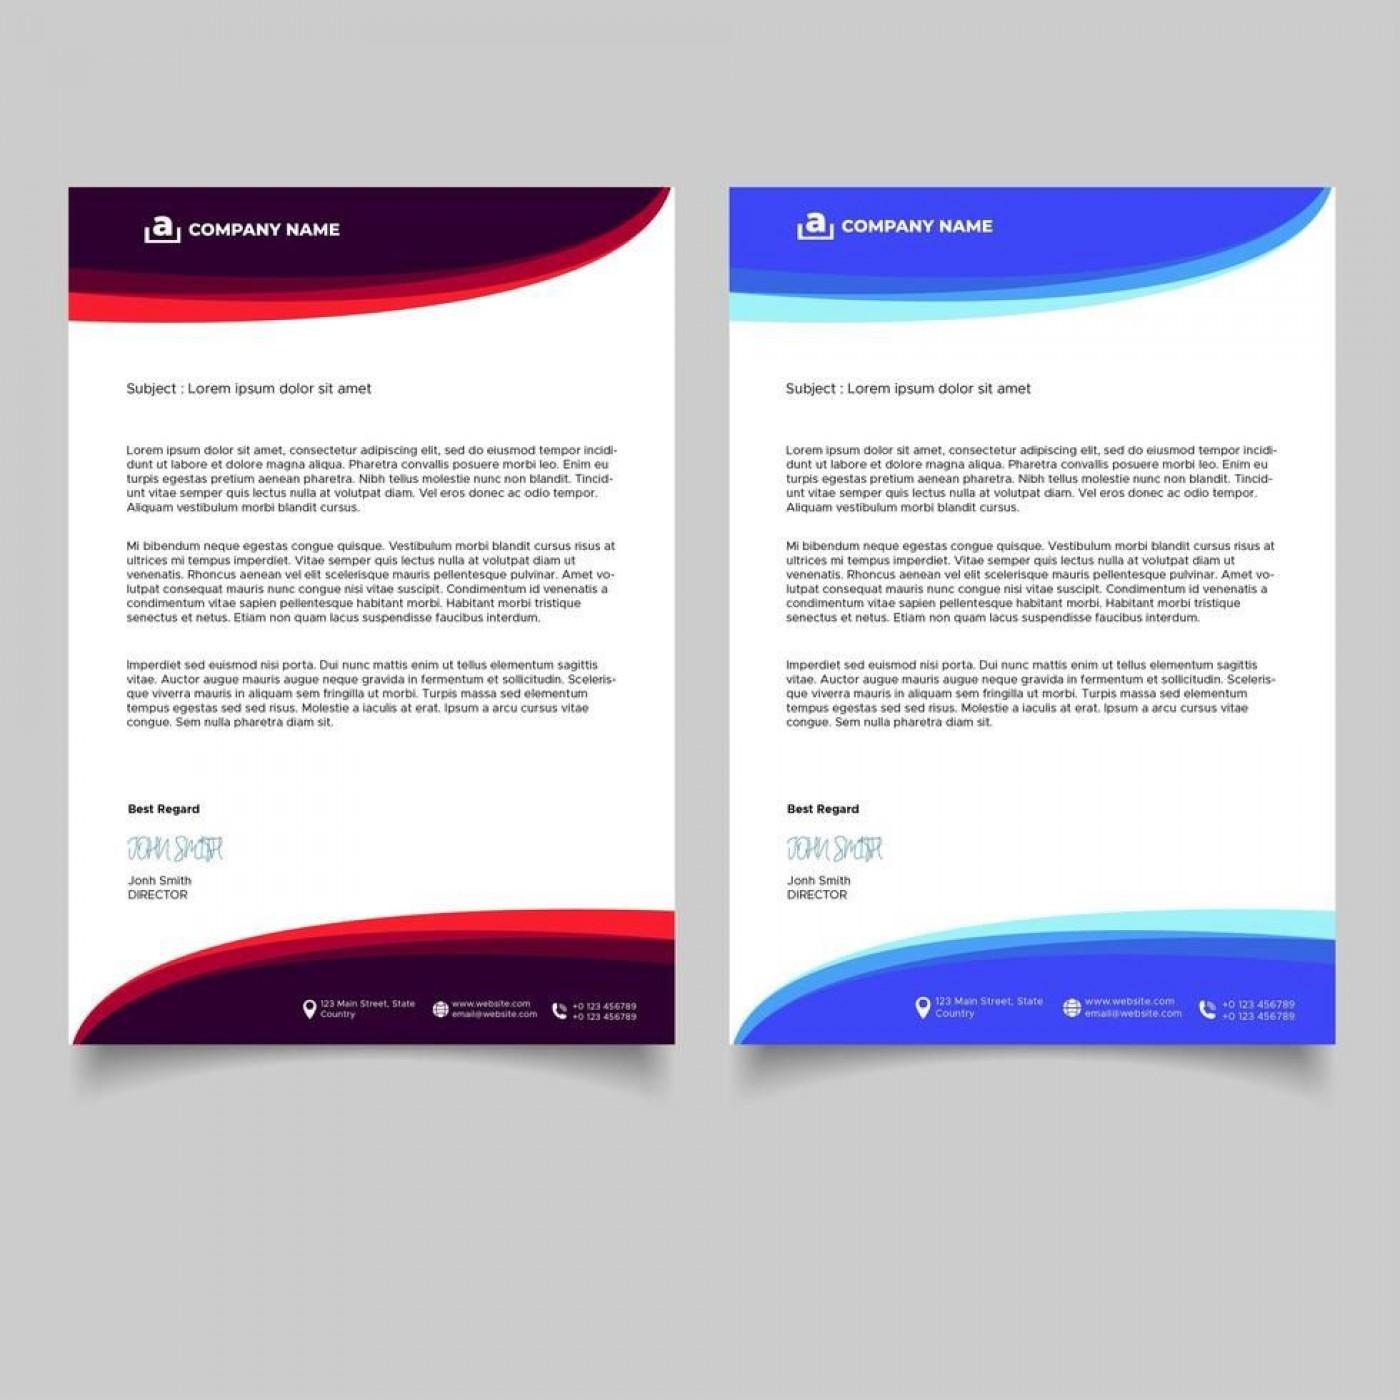 009 Imposing Letterhead Sample Free Download Highest Quality  Template Ai Microsoft Word Restaurant1400